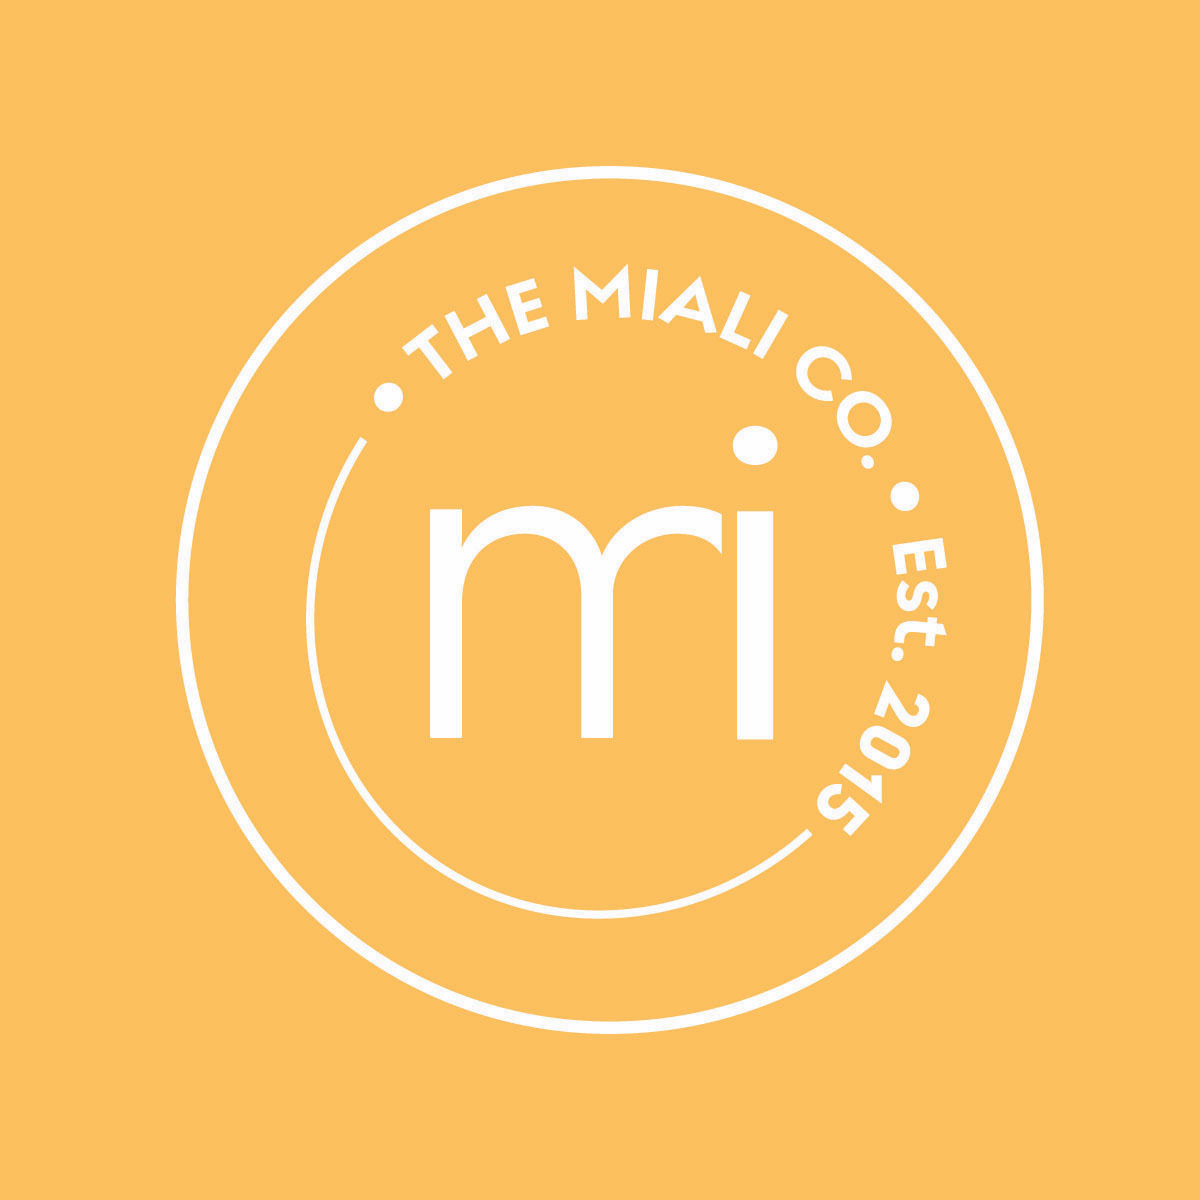 The Miali Co_Logo_White_Mimosa Back.jpg